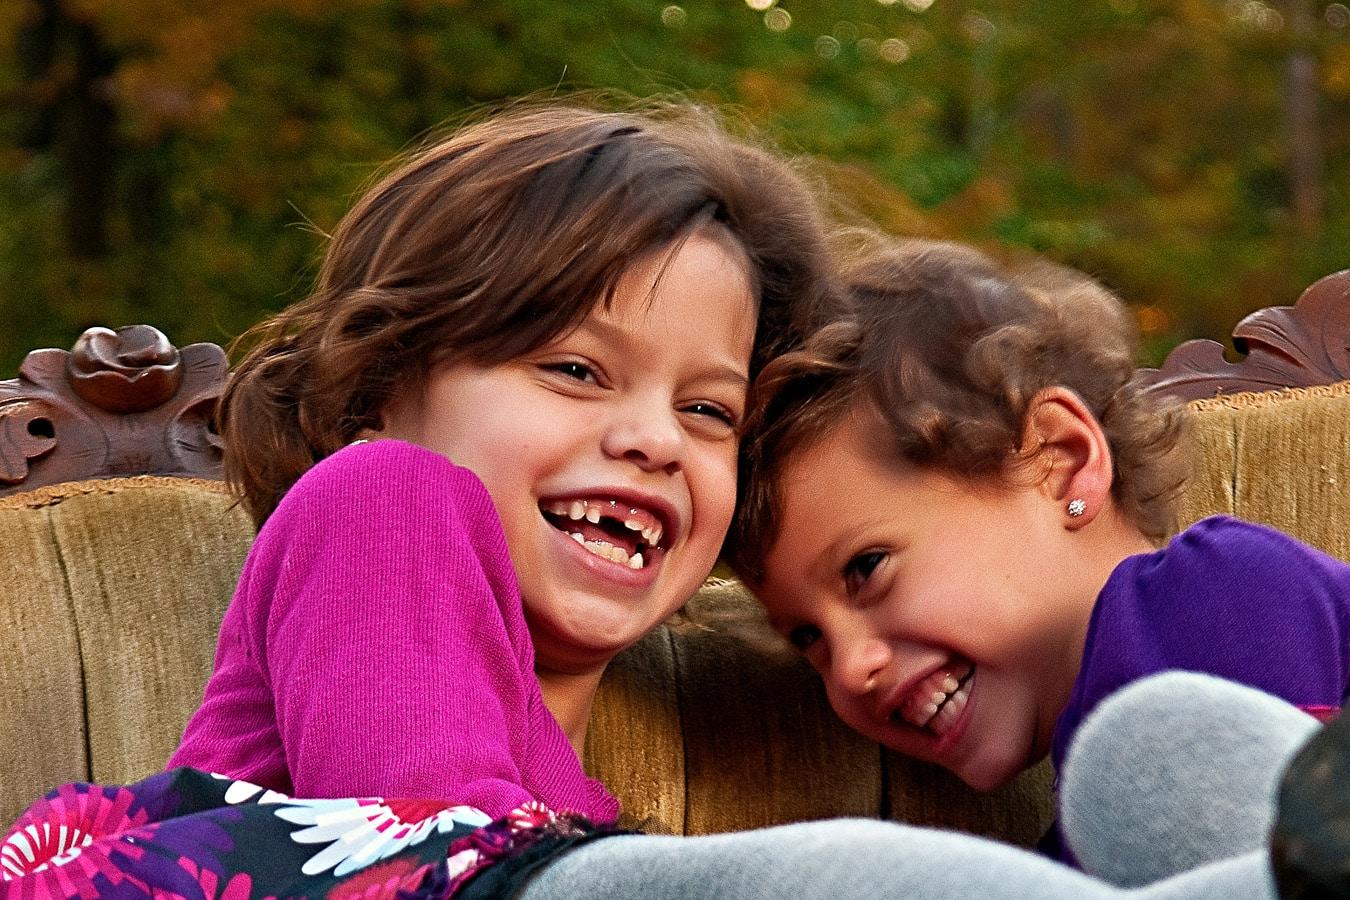 children, portrait, outdoor, natural light, Northern VA